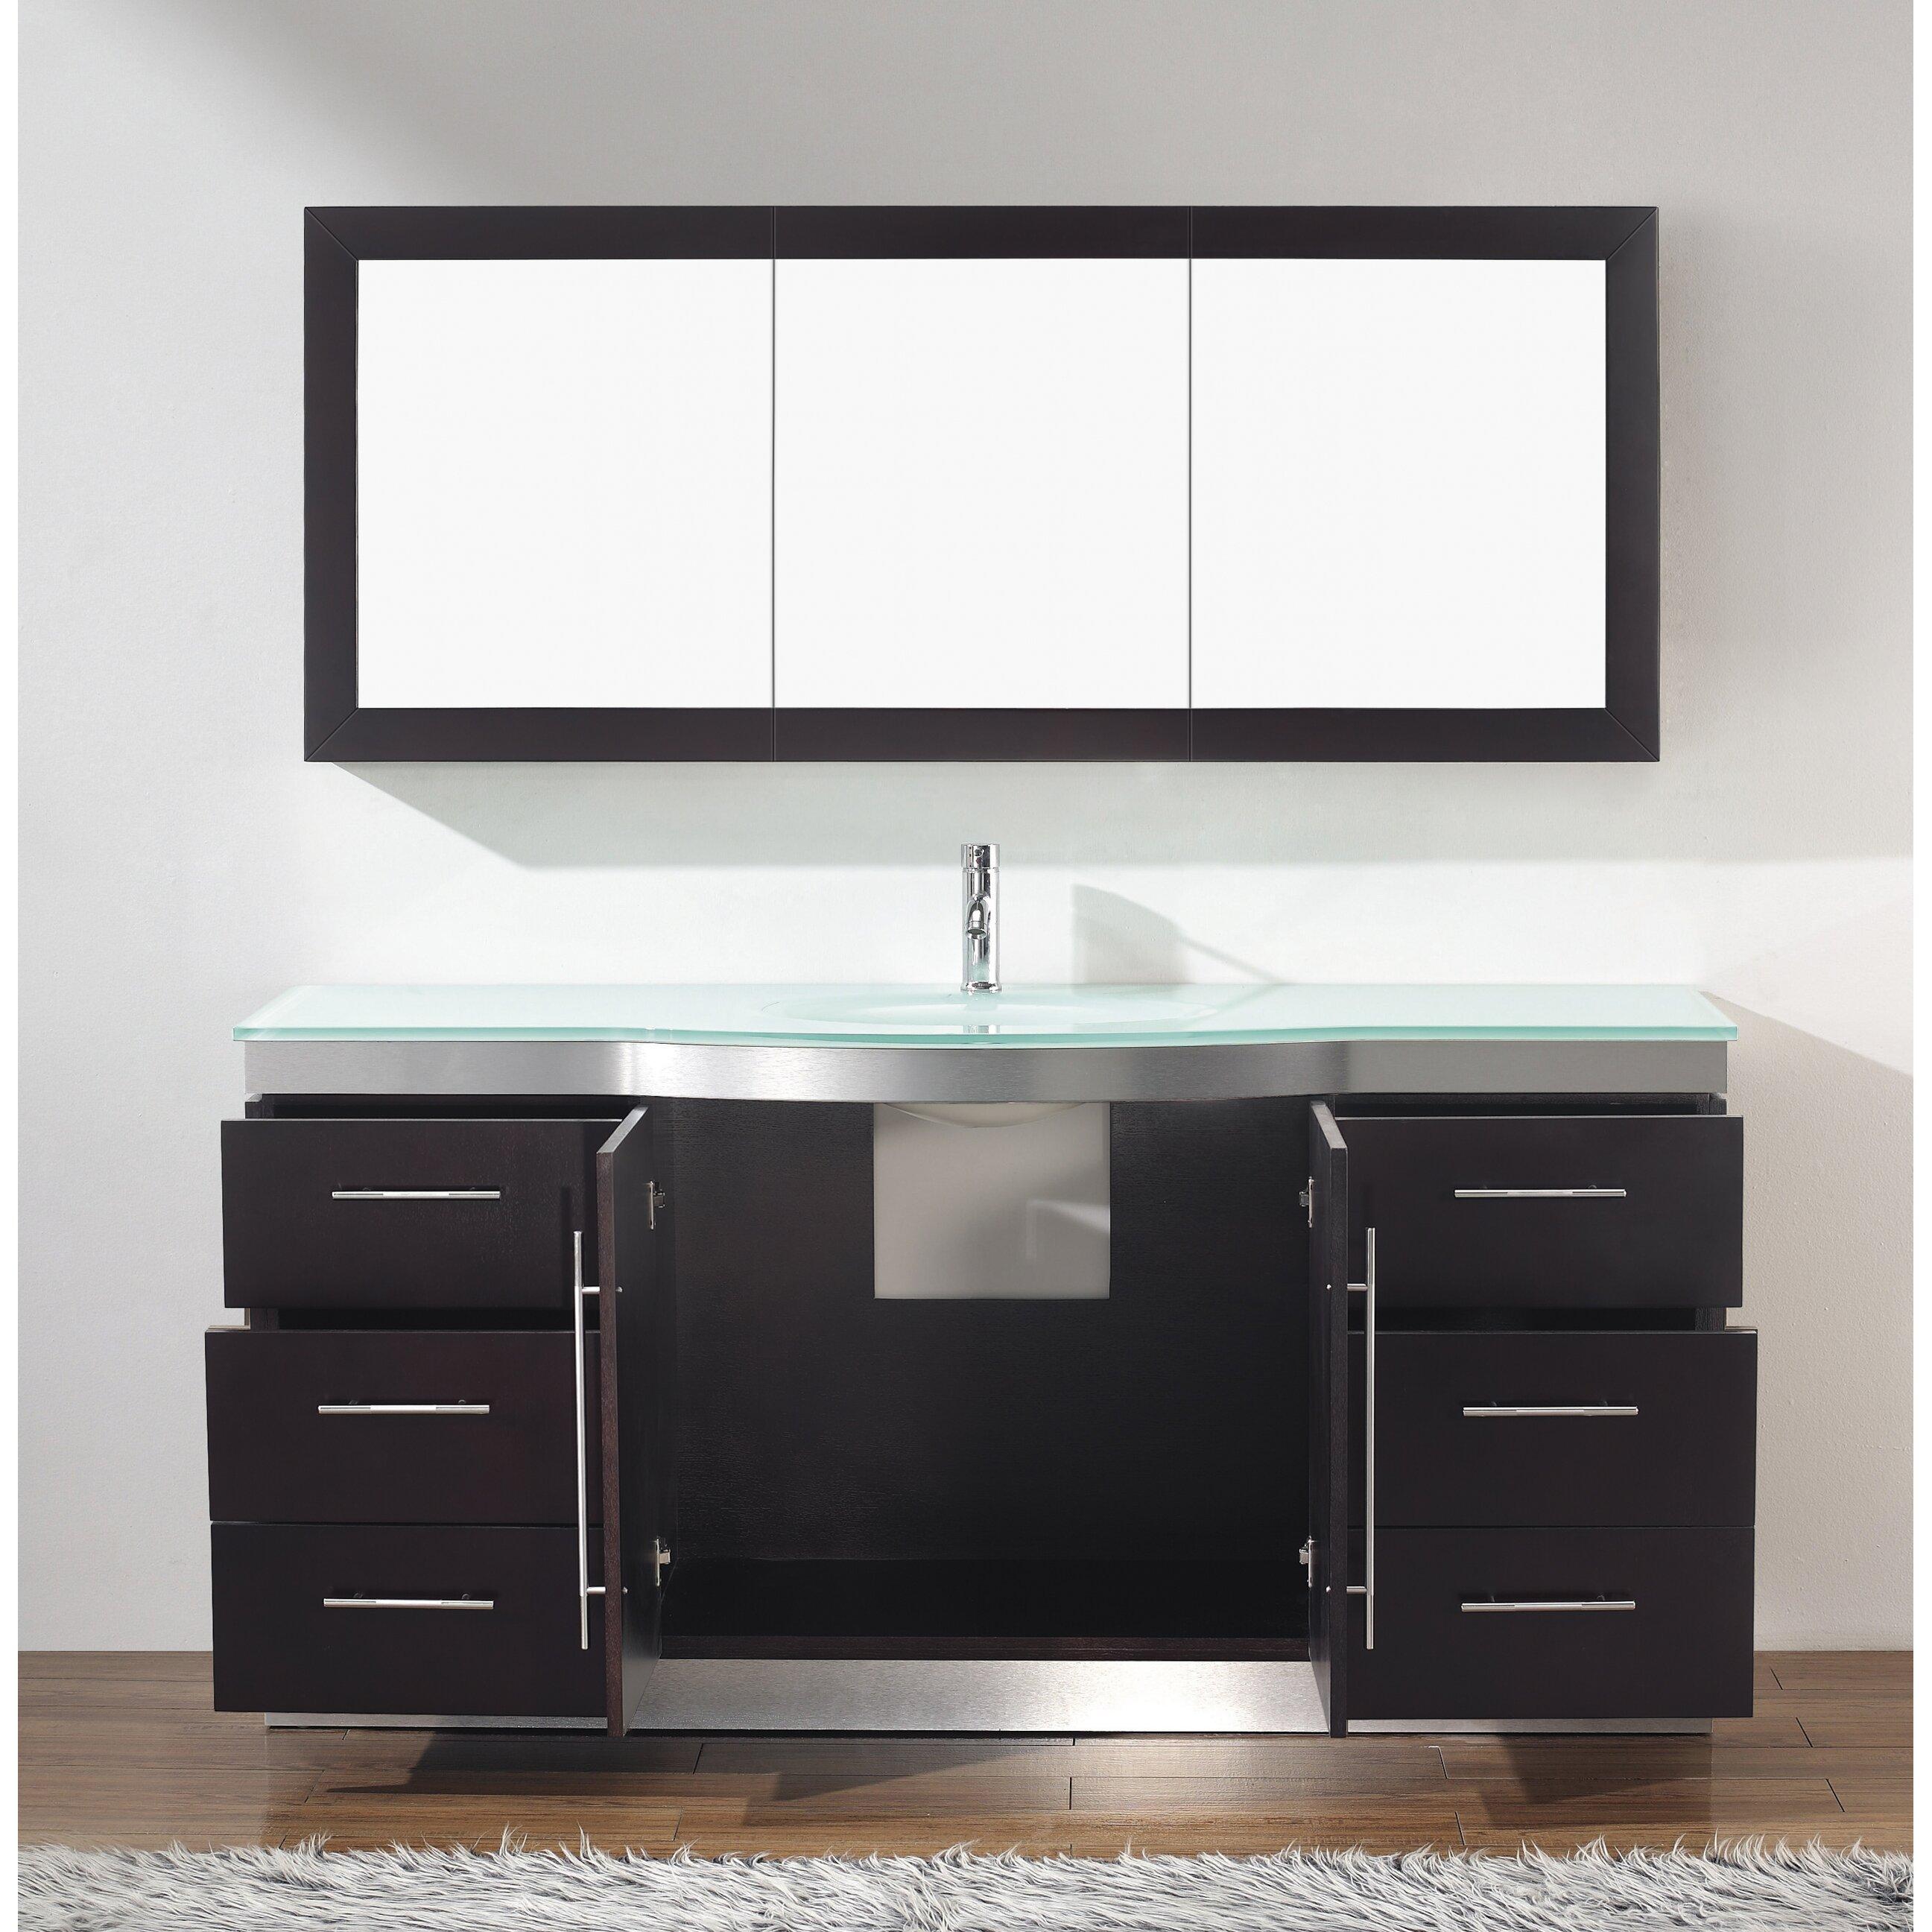 Bauhaus bath diara 72 single bathroom vanity set with for Vanity set with mirror